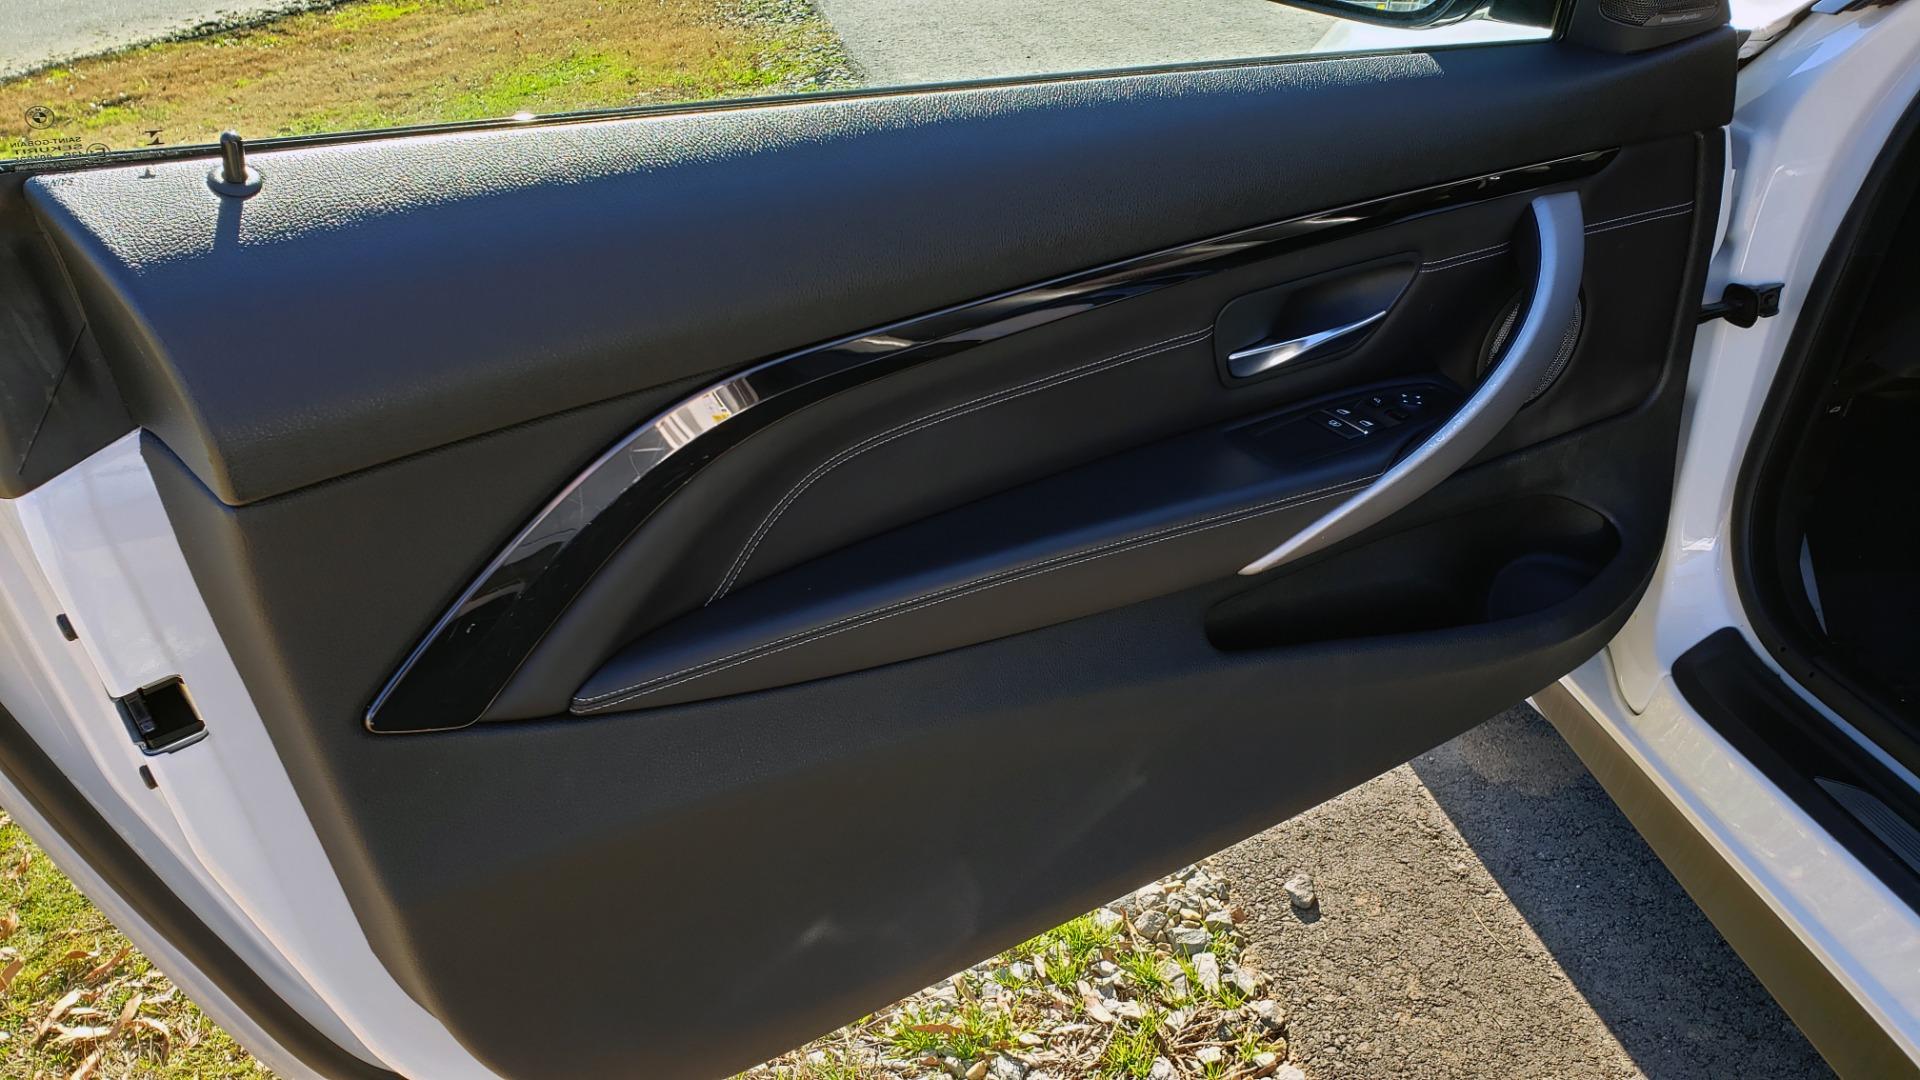 Used 2018 BMW M4 COMP PKG / EXEC / M-DRIVER / PARK CNTRL / ACTIVE BLIND SPOT for sale Sold at Formula Imports in Charlotte NC 28227 33